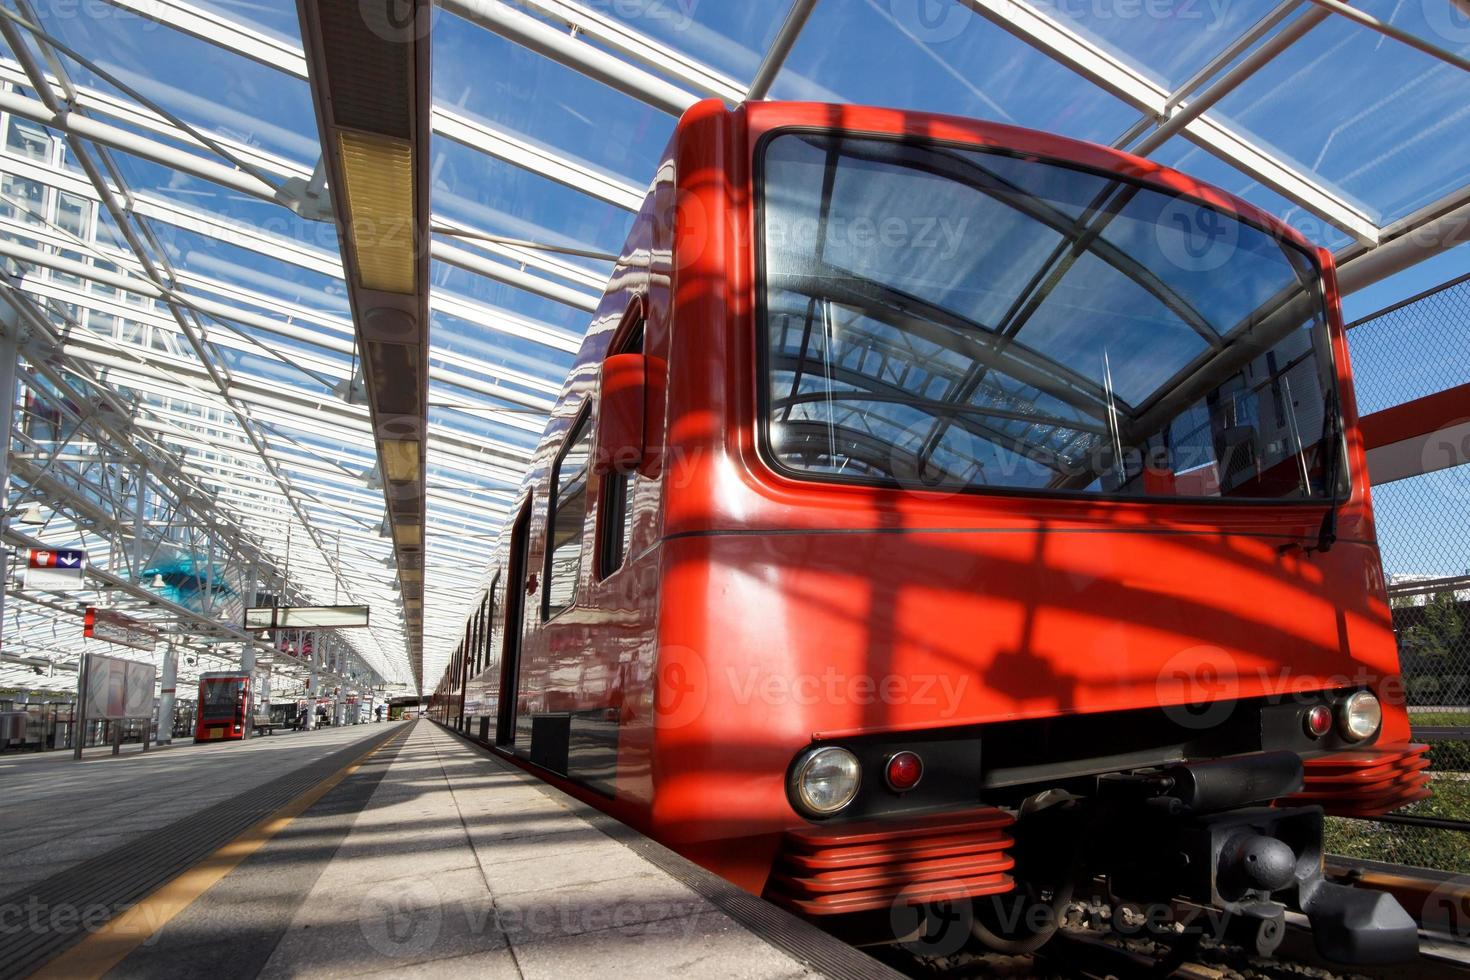 tunnelbanetåg foto